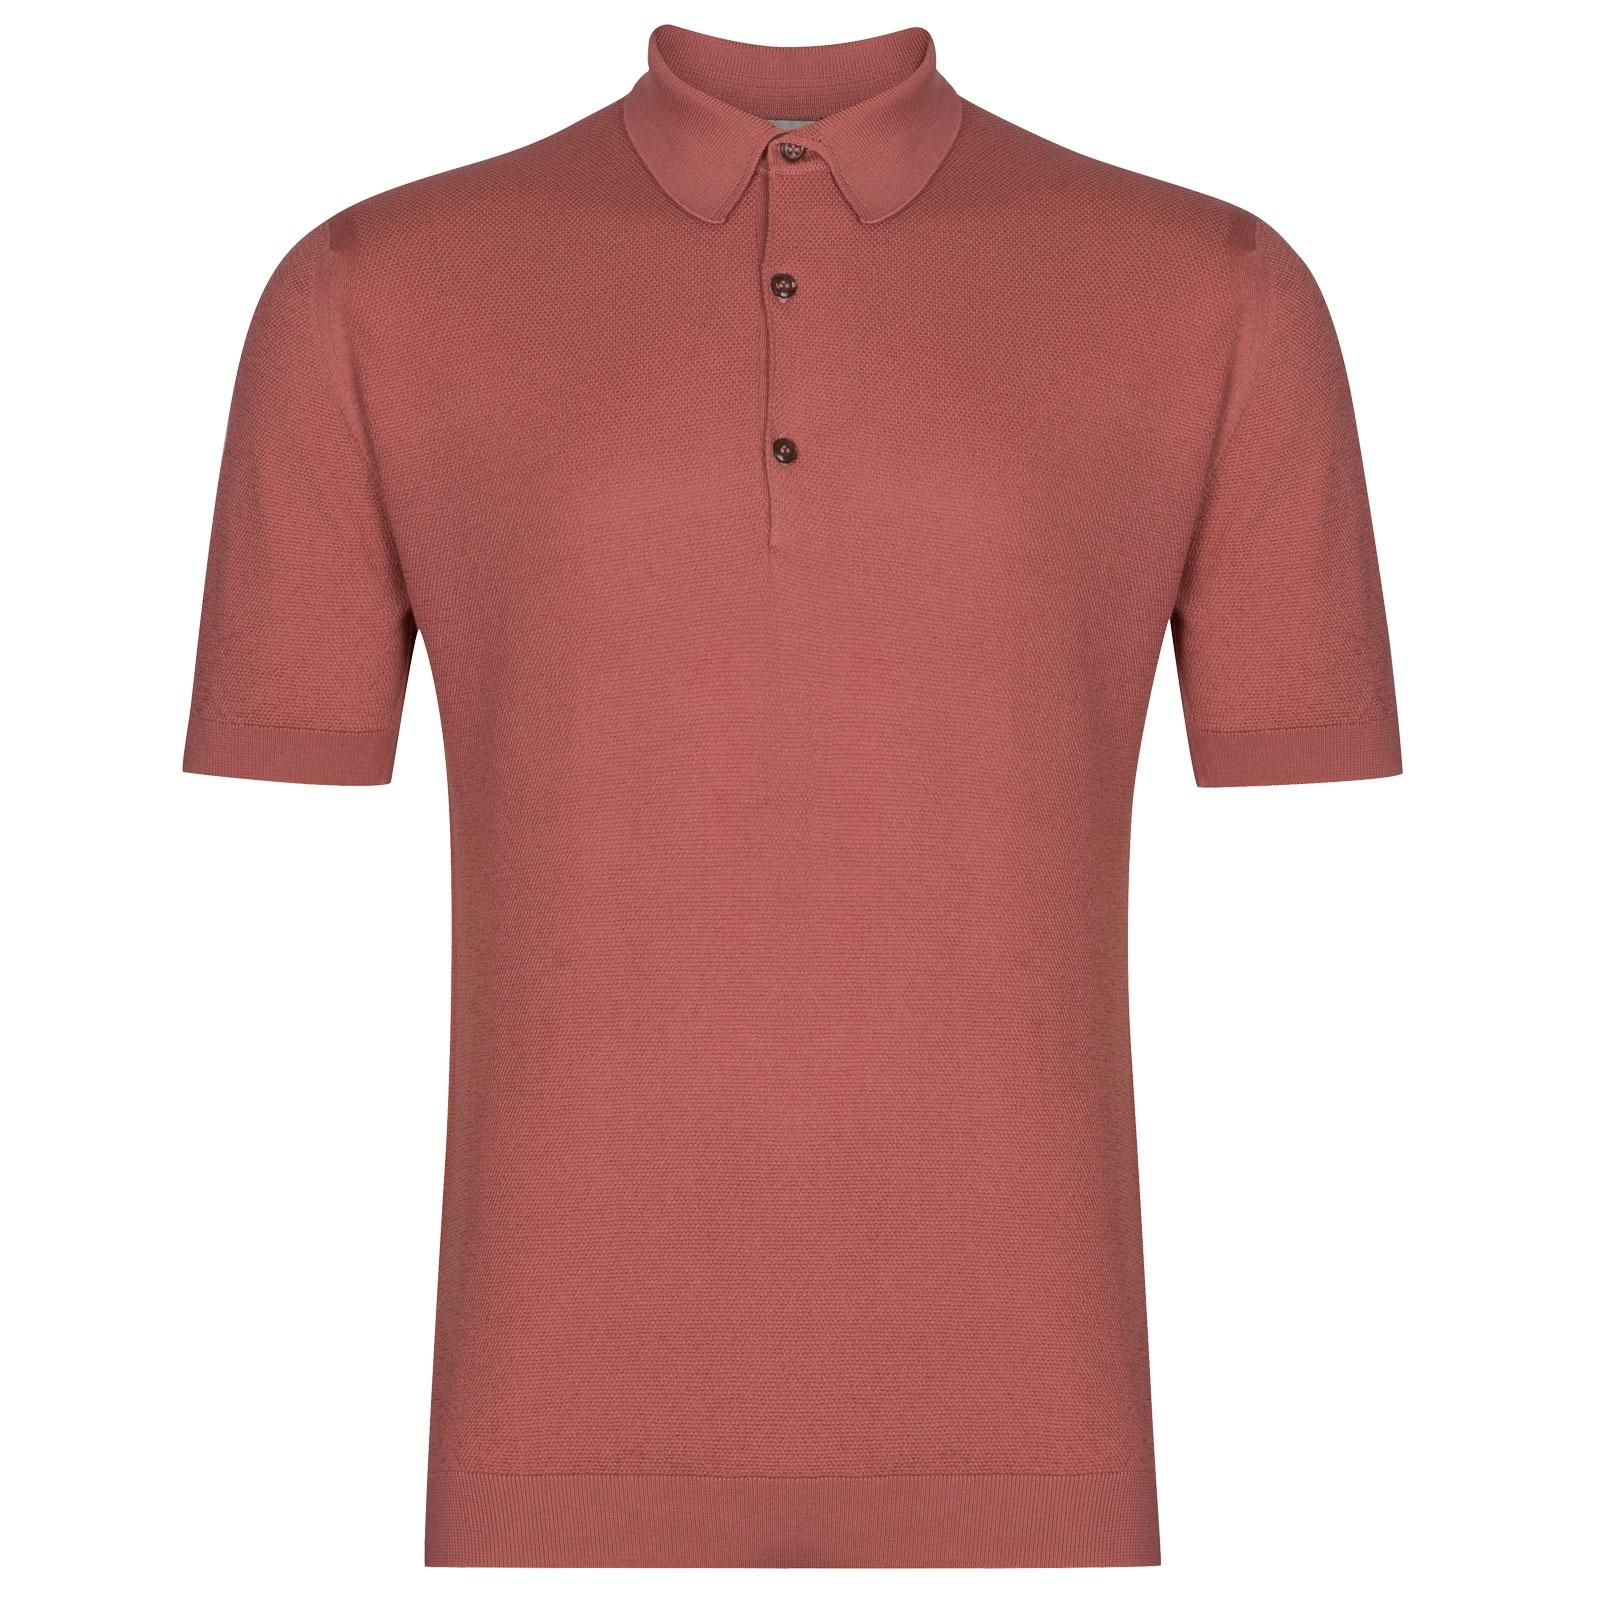 John Smedley Roth in Azalea Pink Shirt-LGE